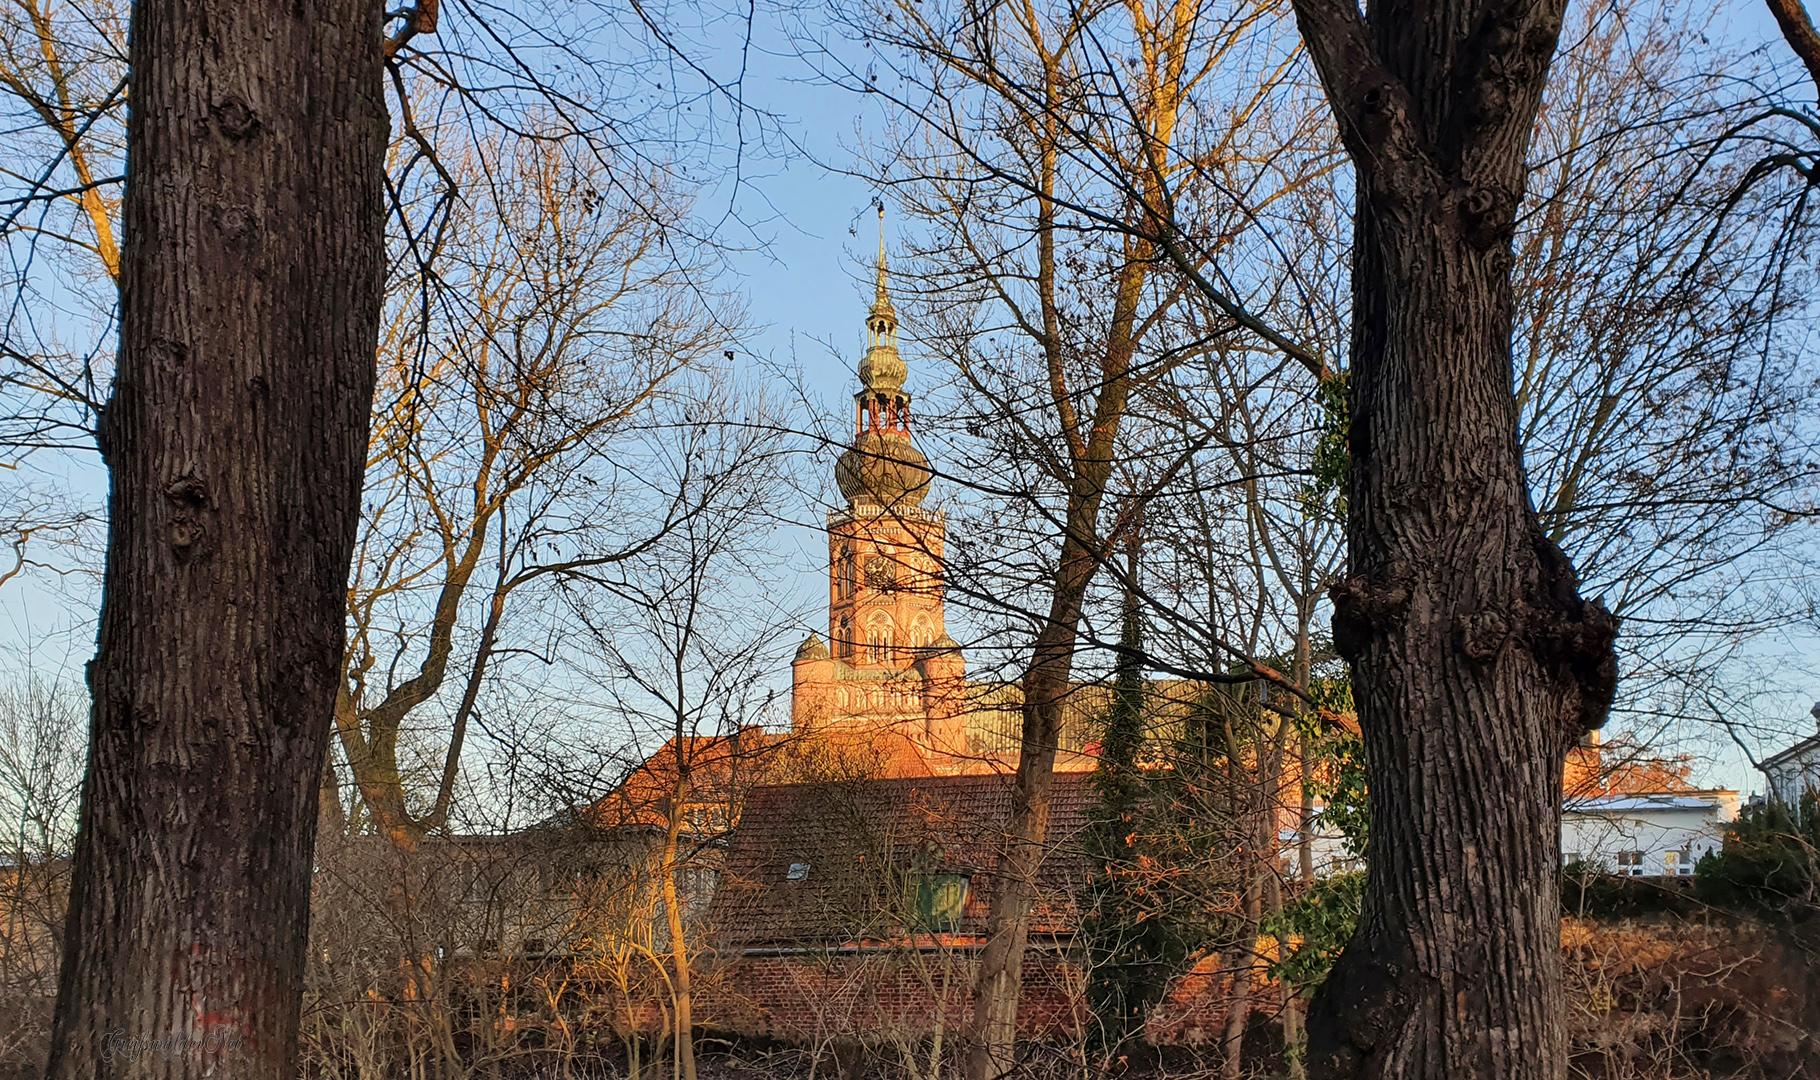 Blick zum Dom St. Nikolai in Greifswald